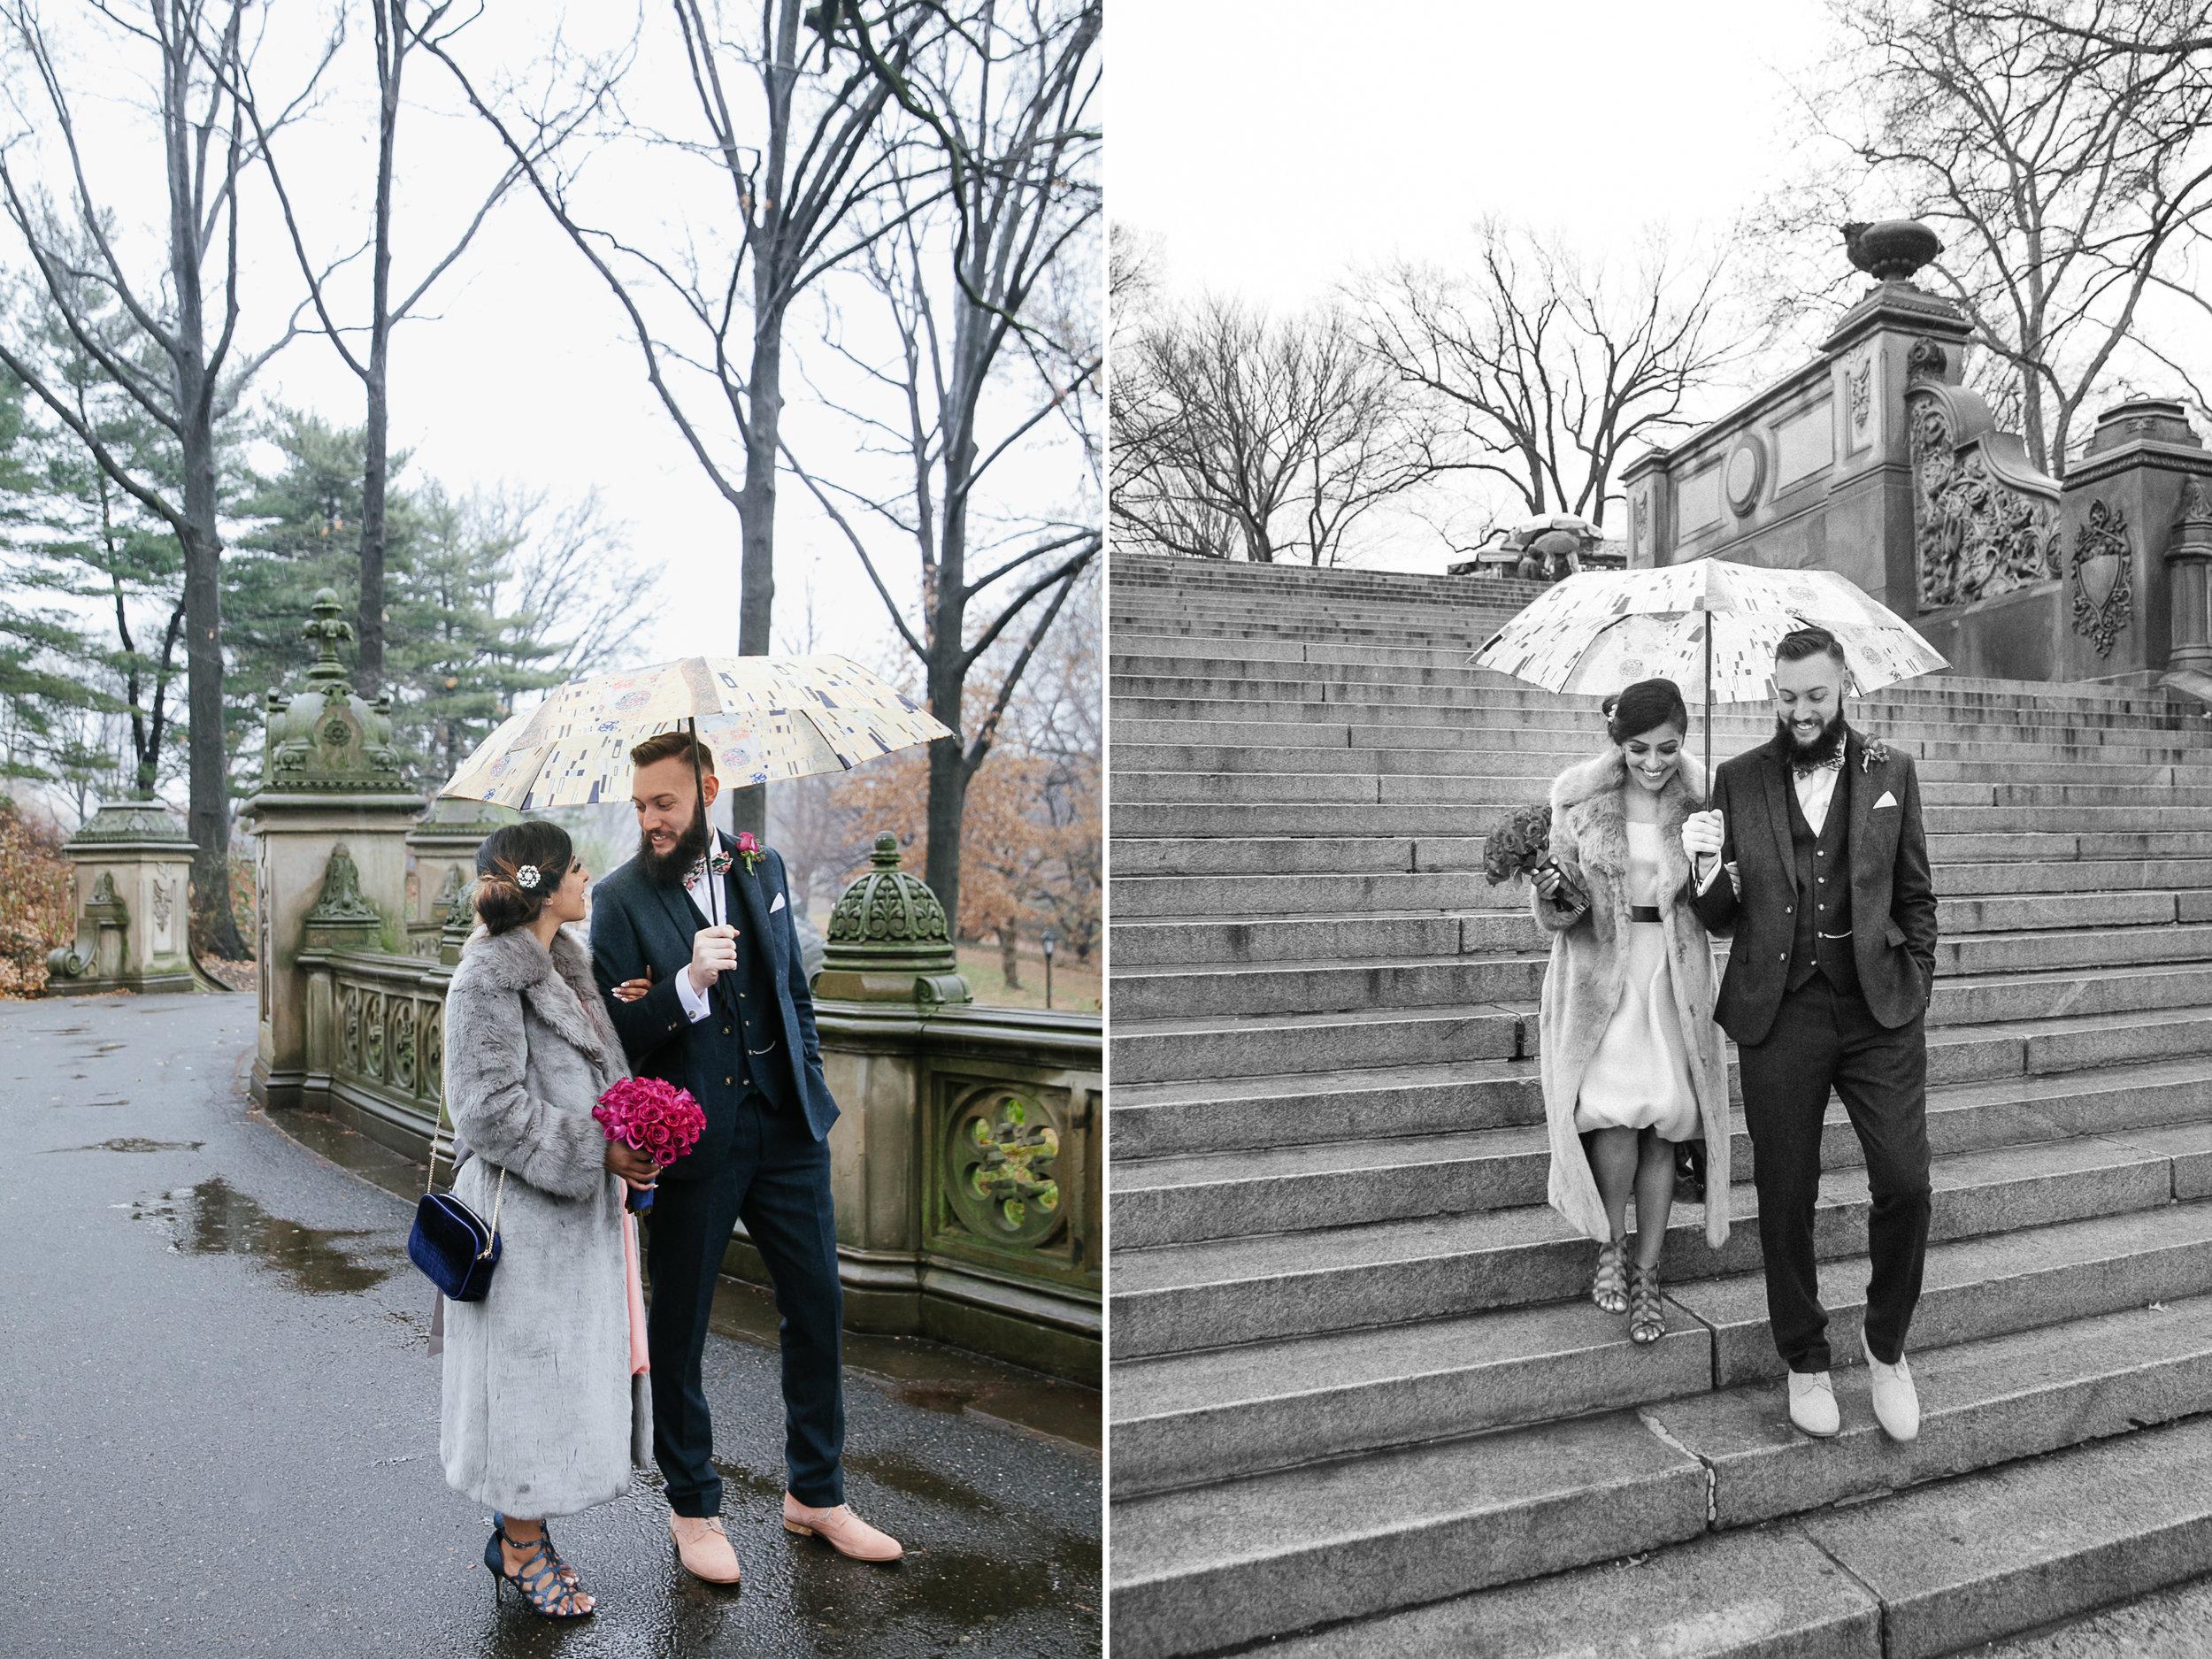 Central-park-wedding-S&K-10.jpg